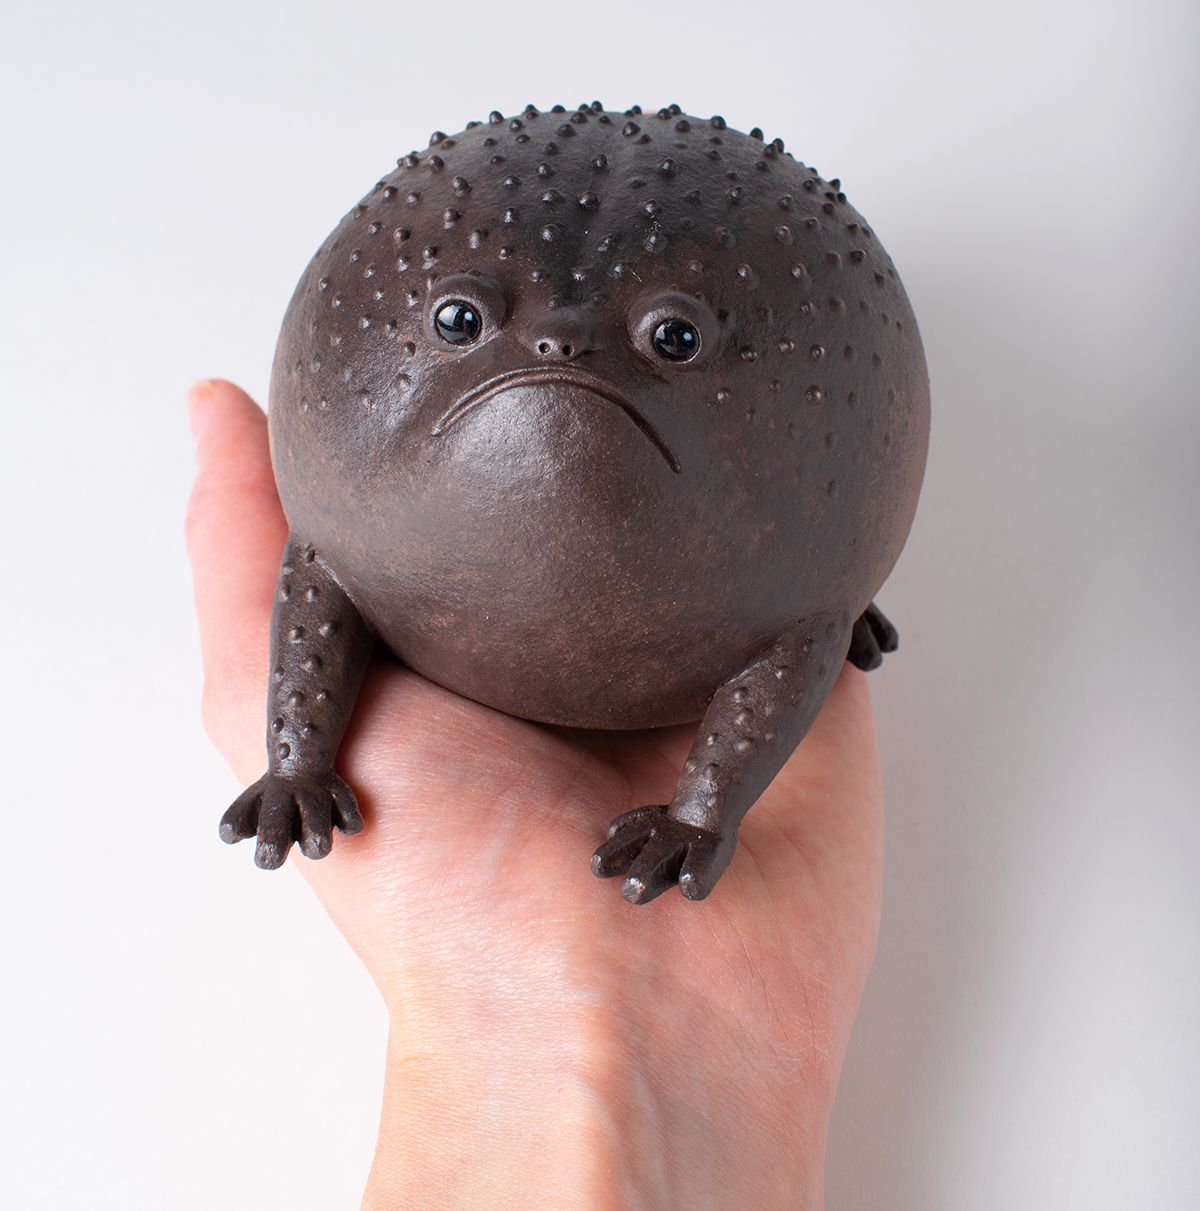 ceramic creatures noseymungo blackrainfrog helen burgess